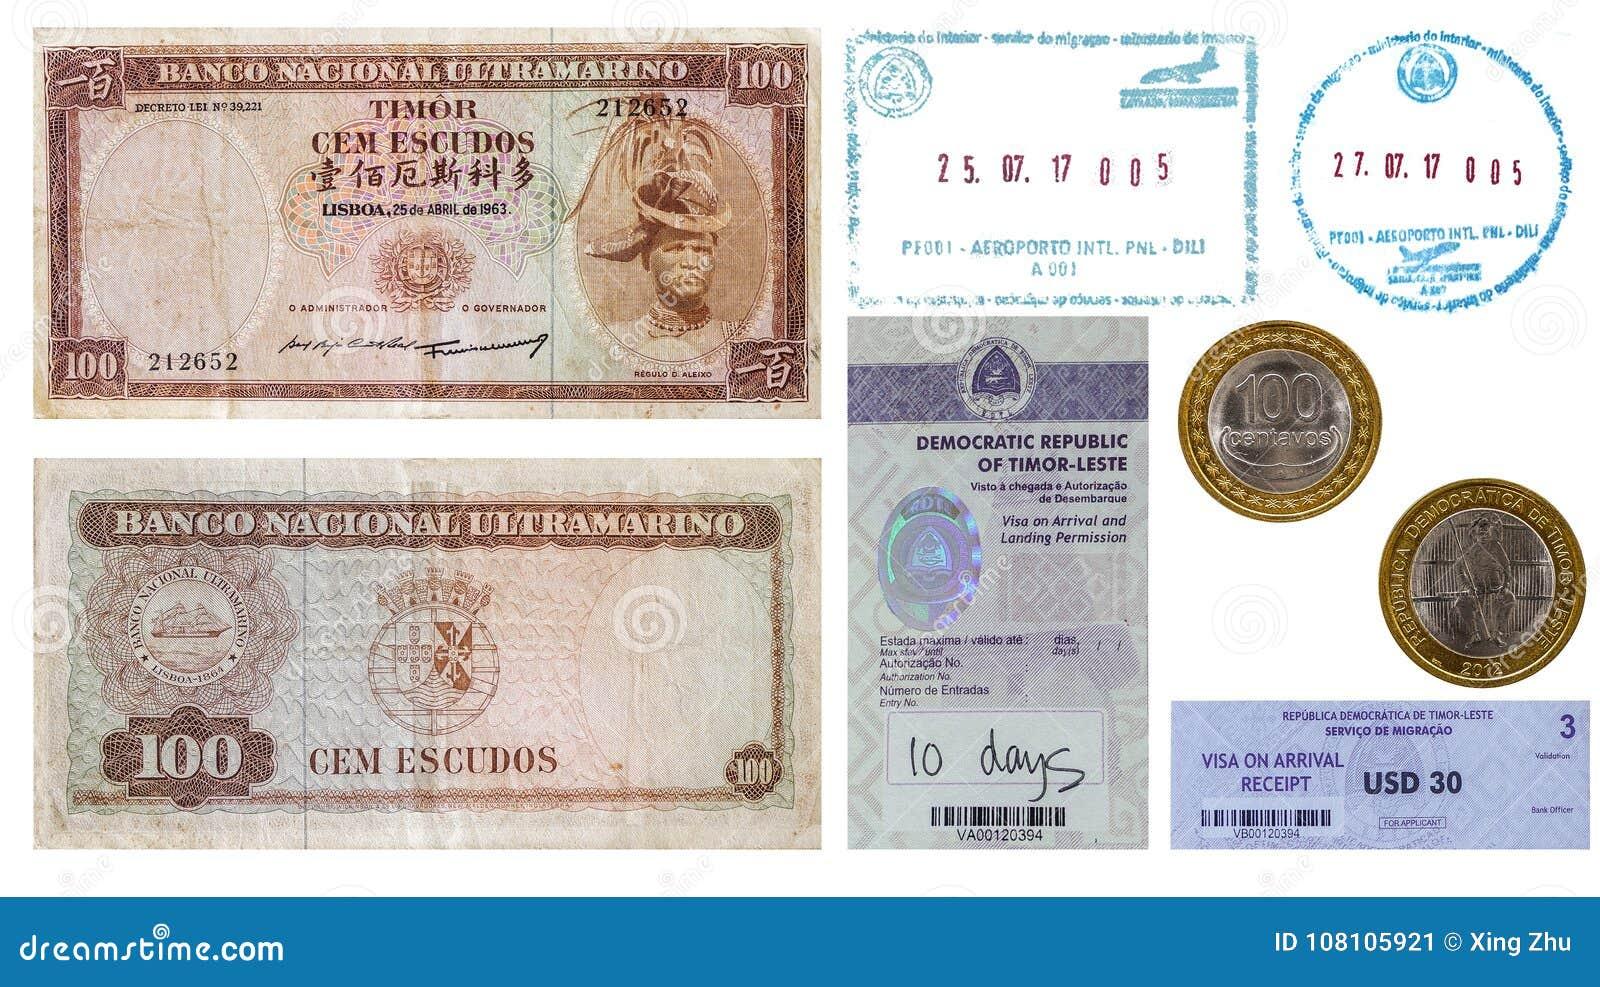 Aeroporto Dili : Timor leste money and visa stamp stock image image of sample note